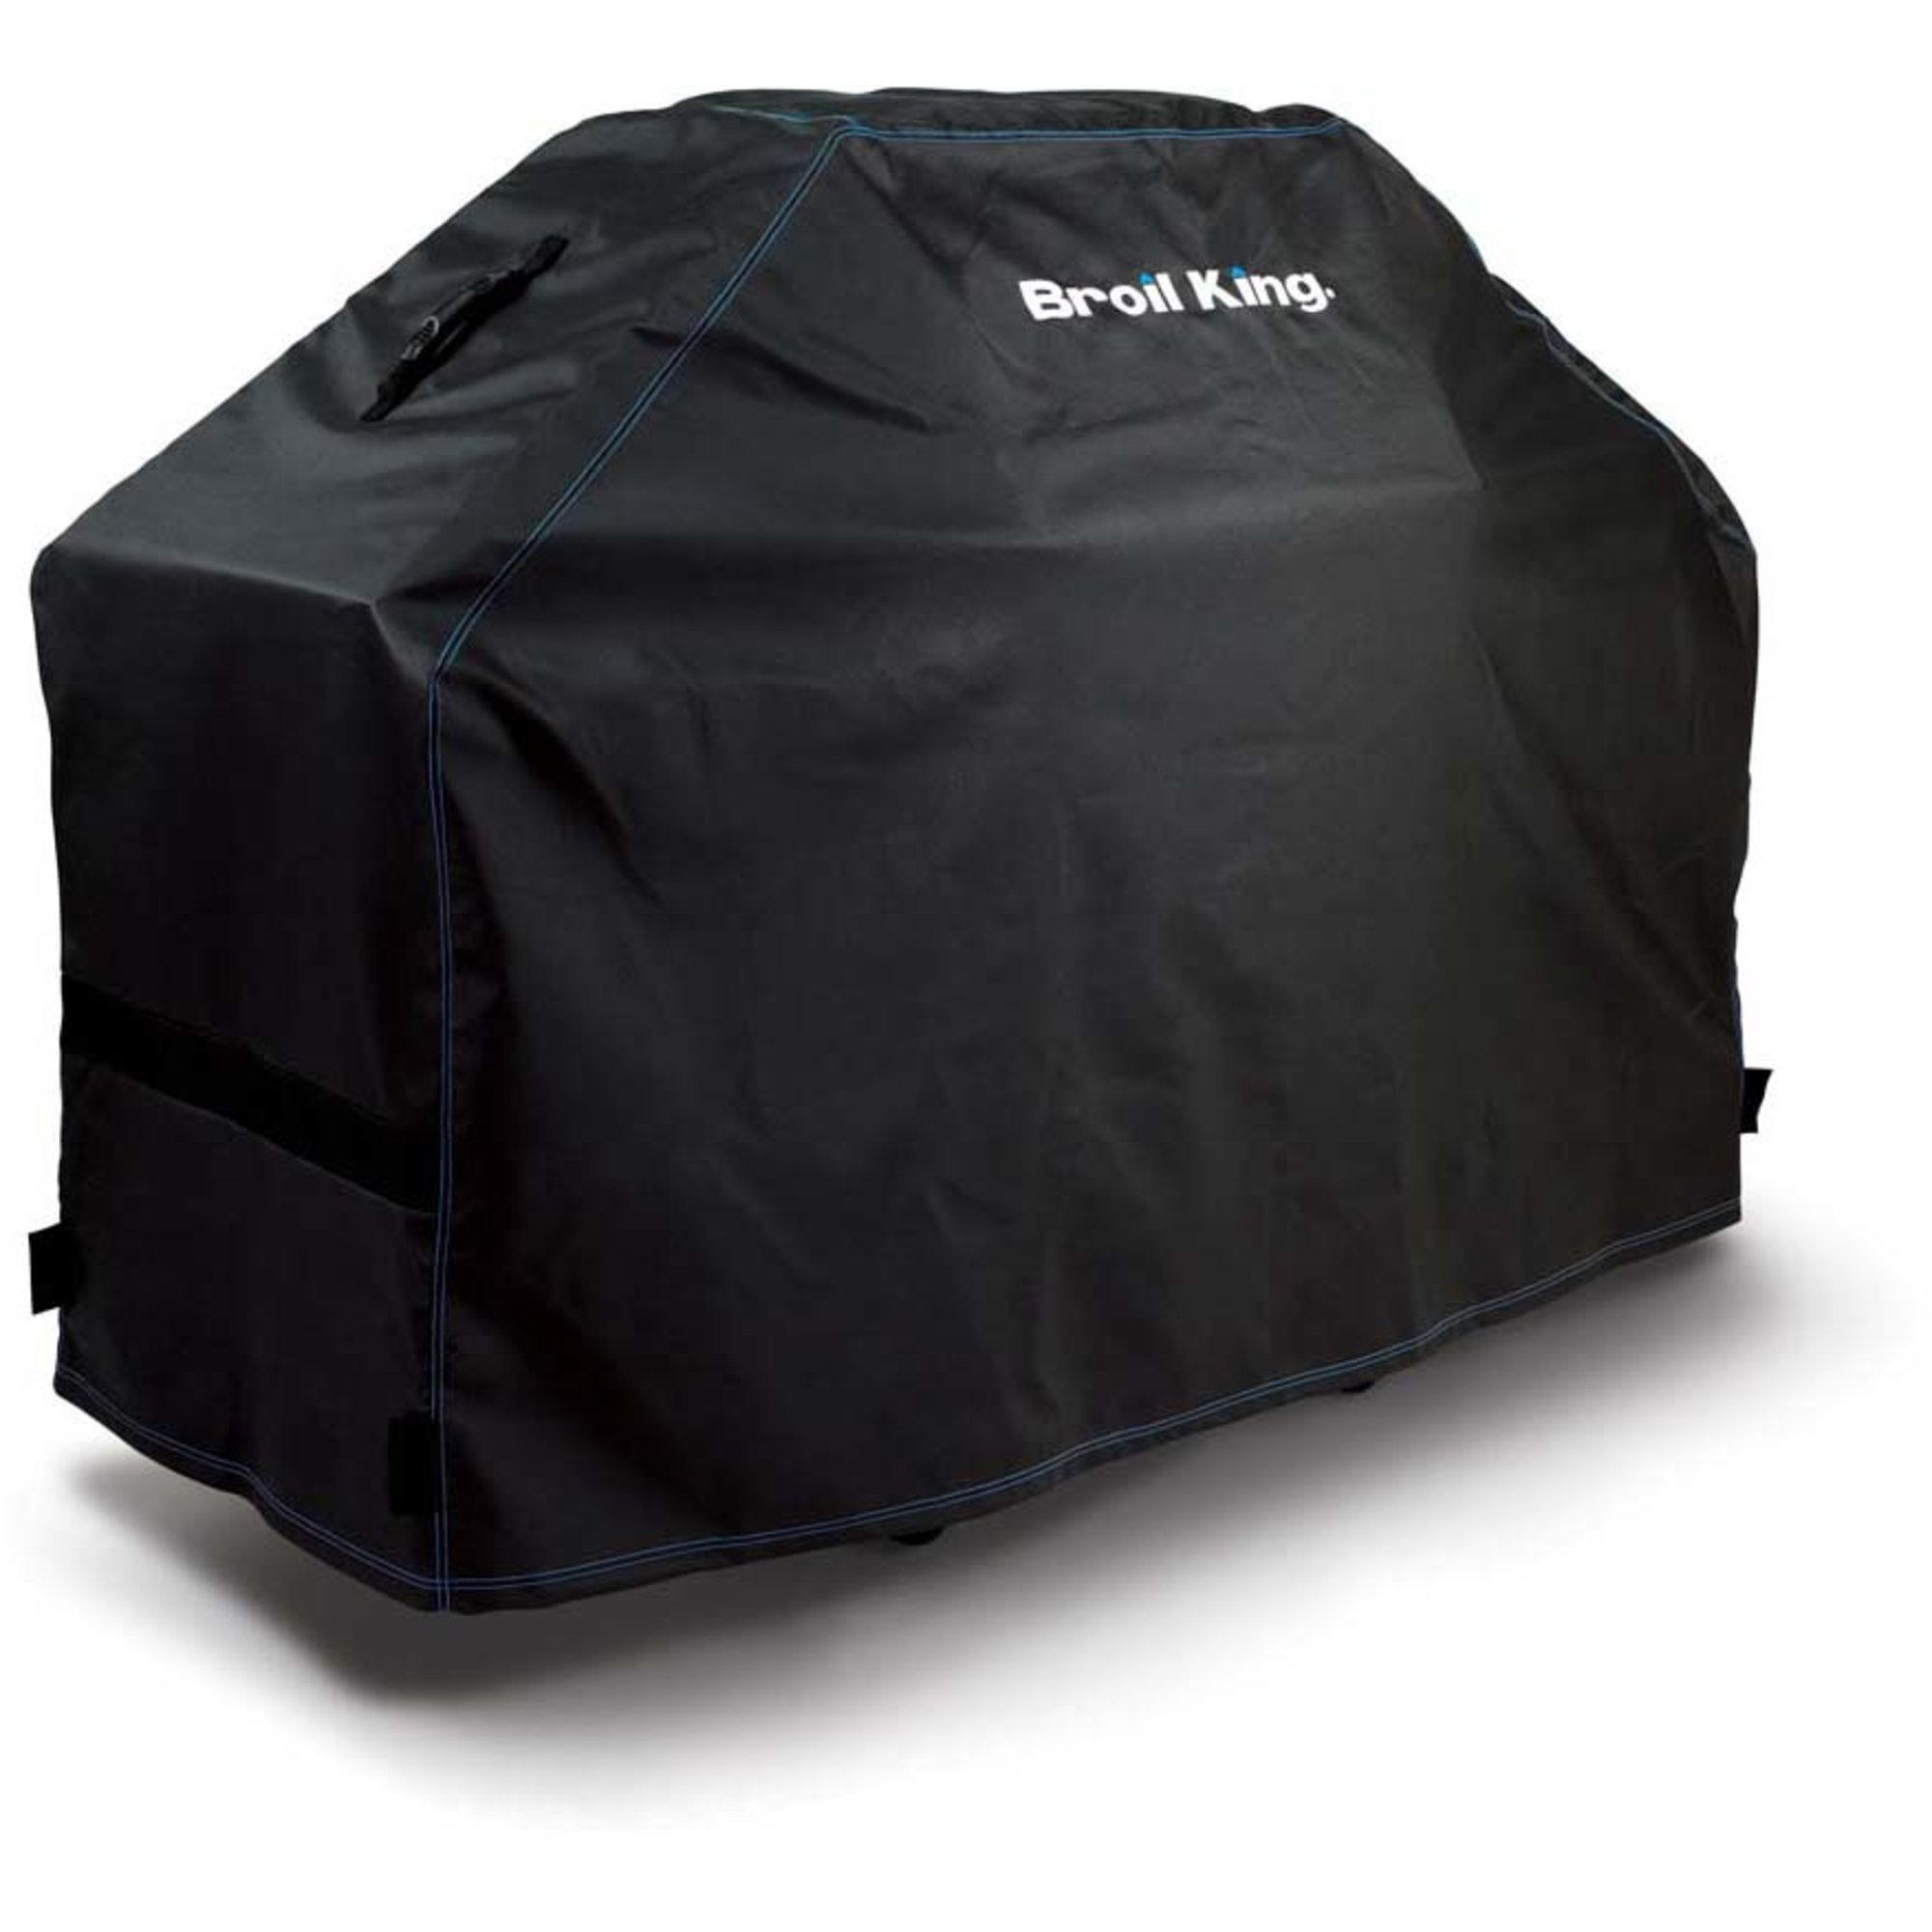 Broil King Överdrag Premium BARON 440/490′